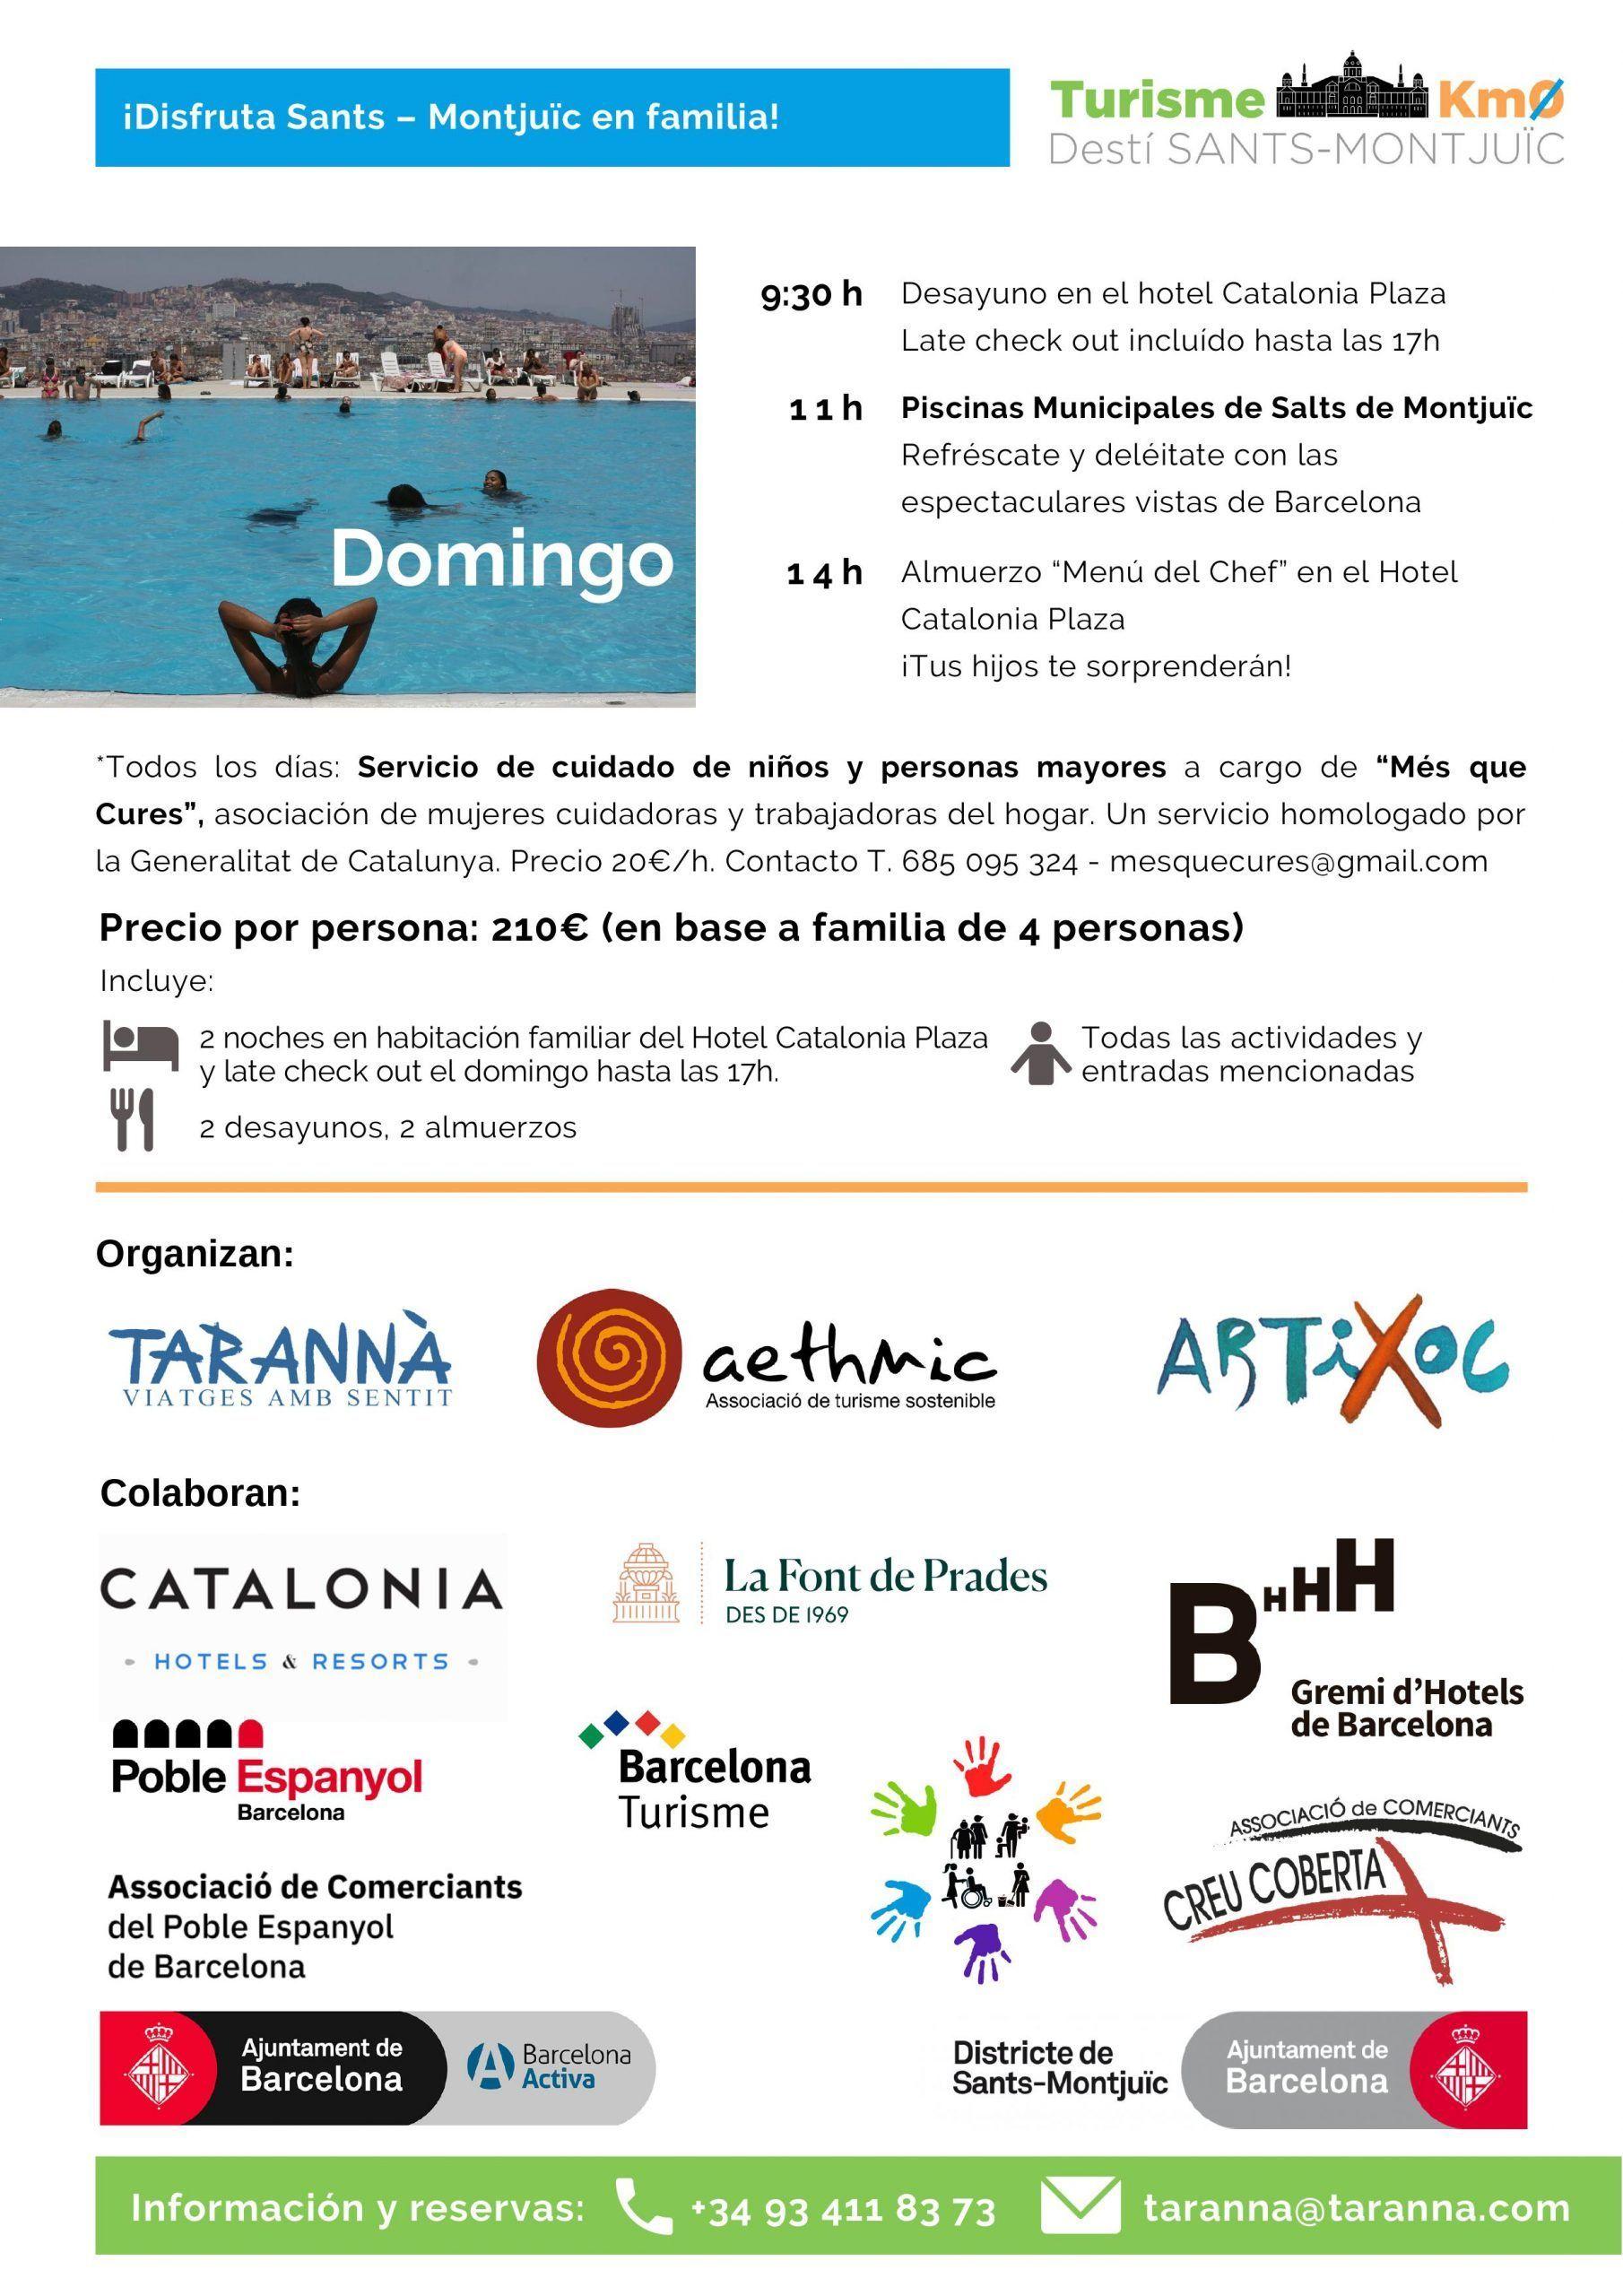 Turismo km0 familias Barcelona